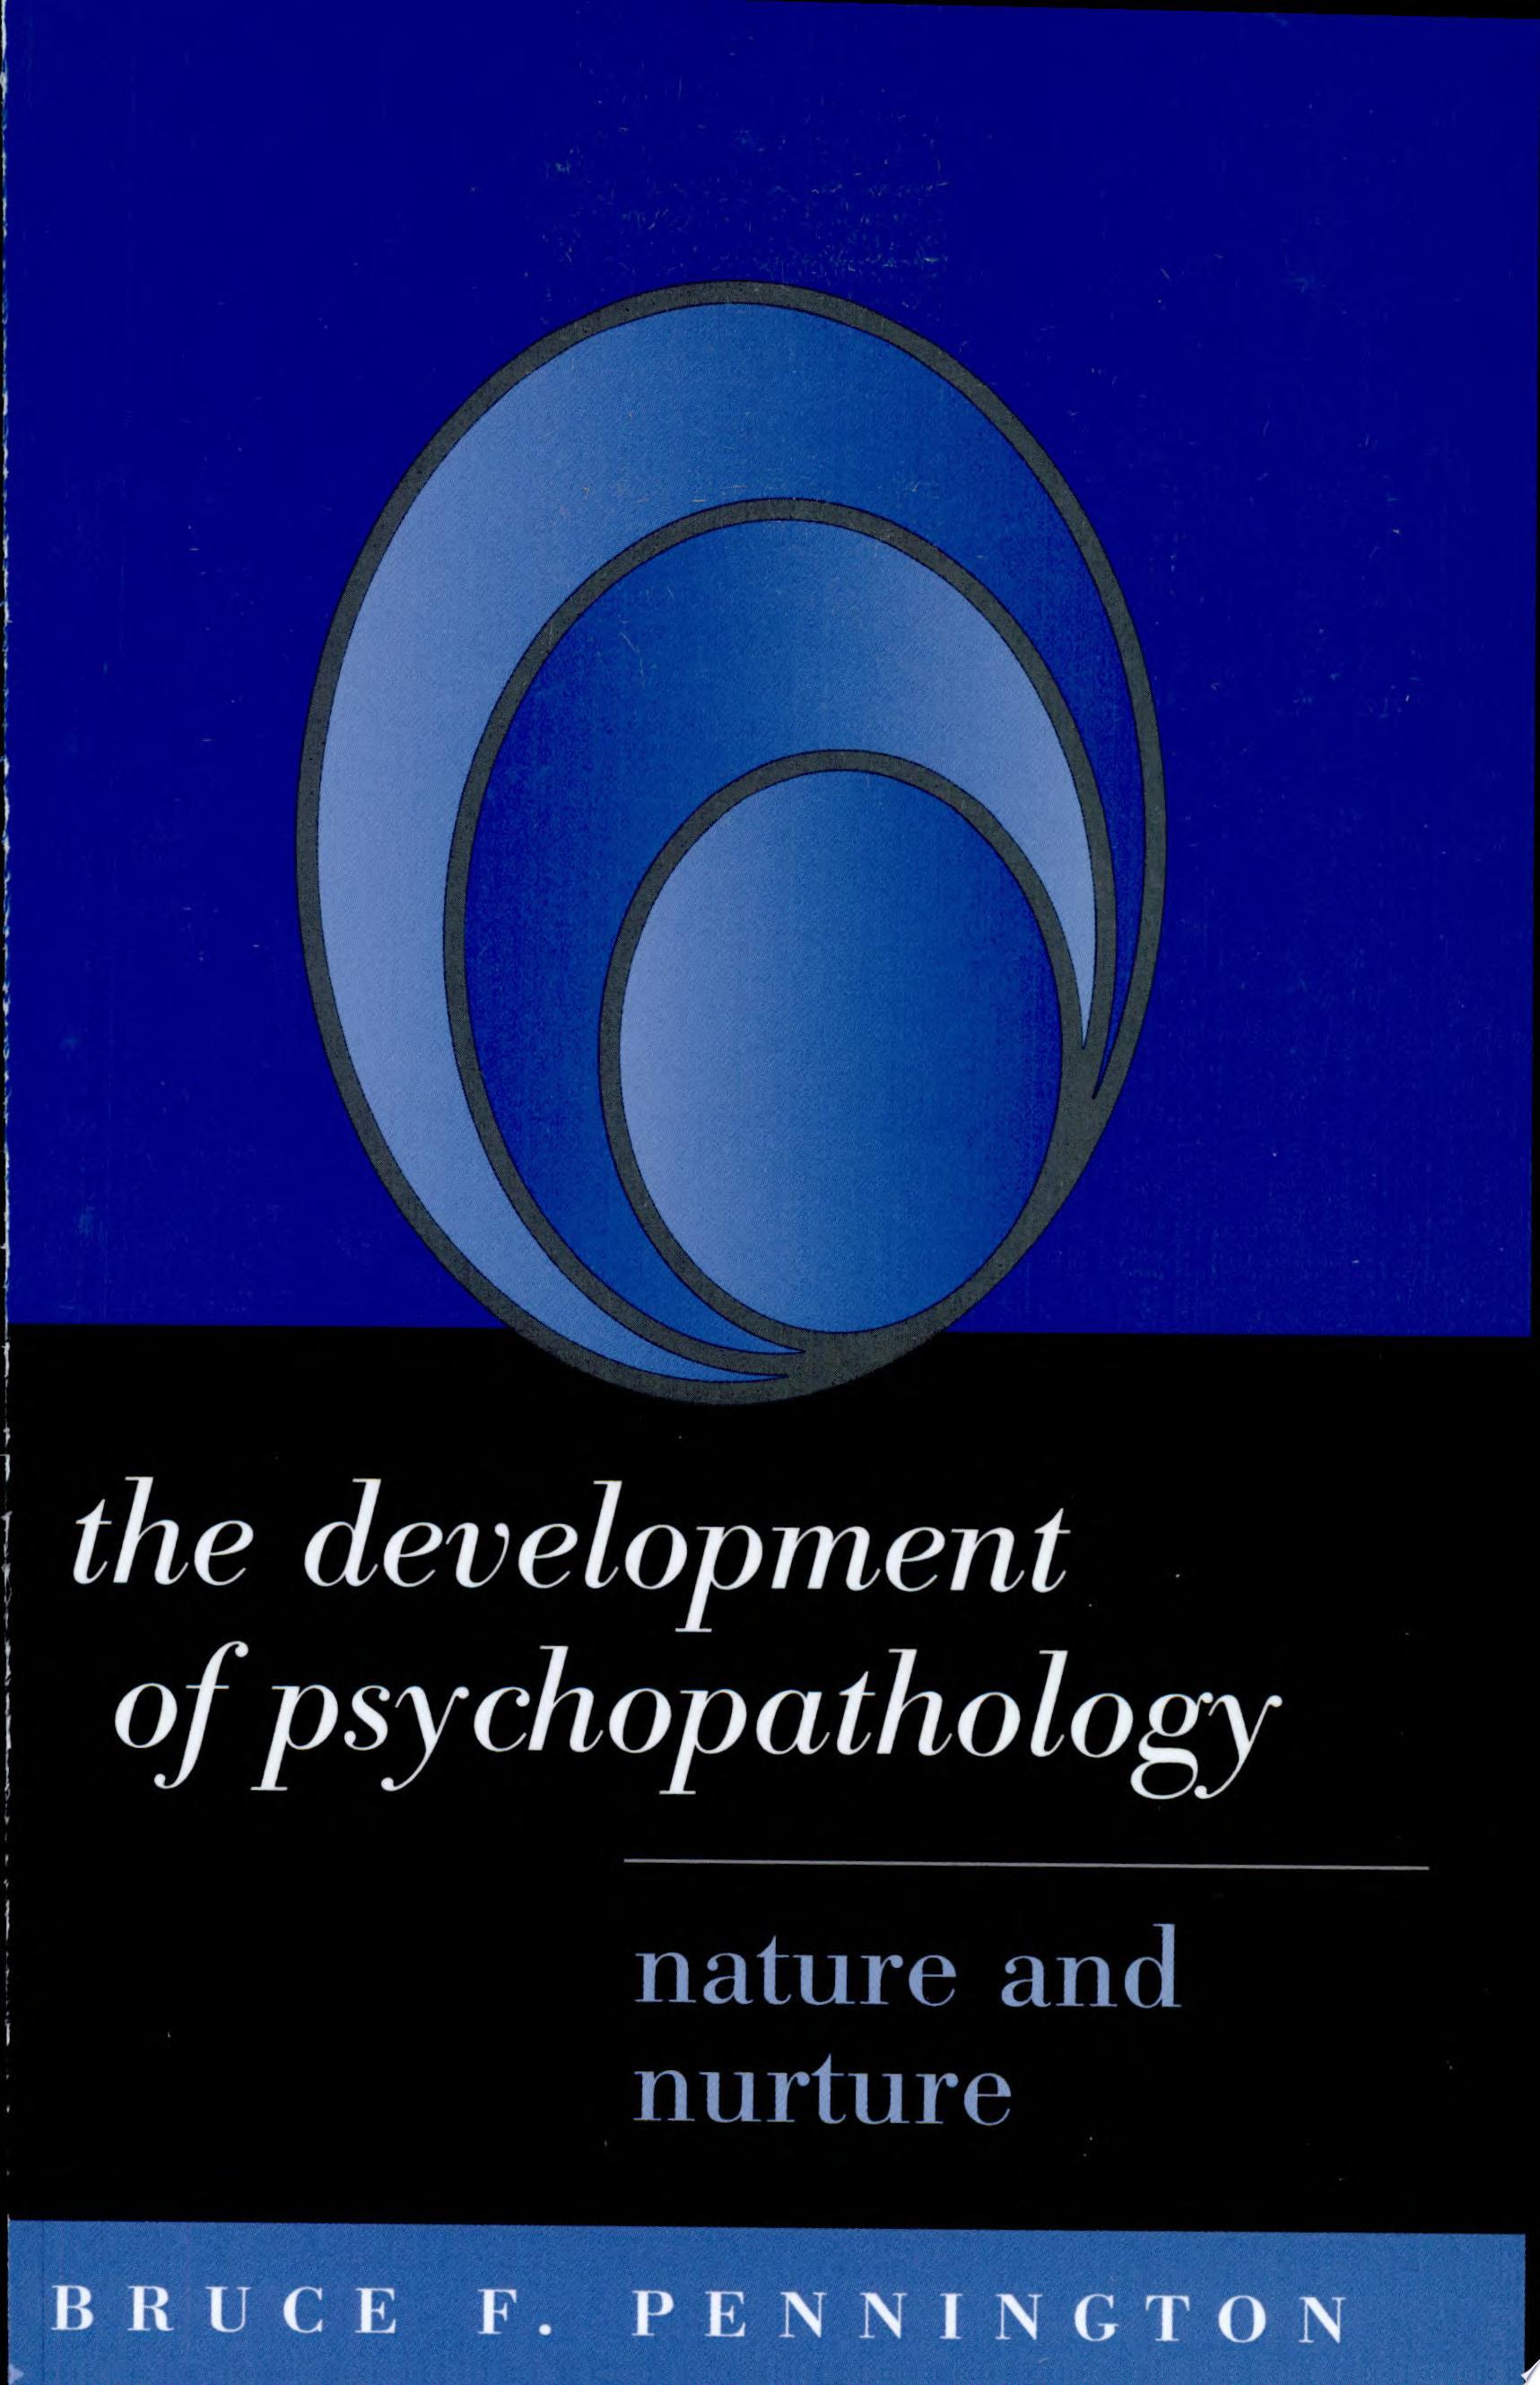 The Development of Psychopathology